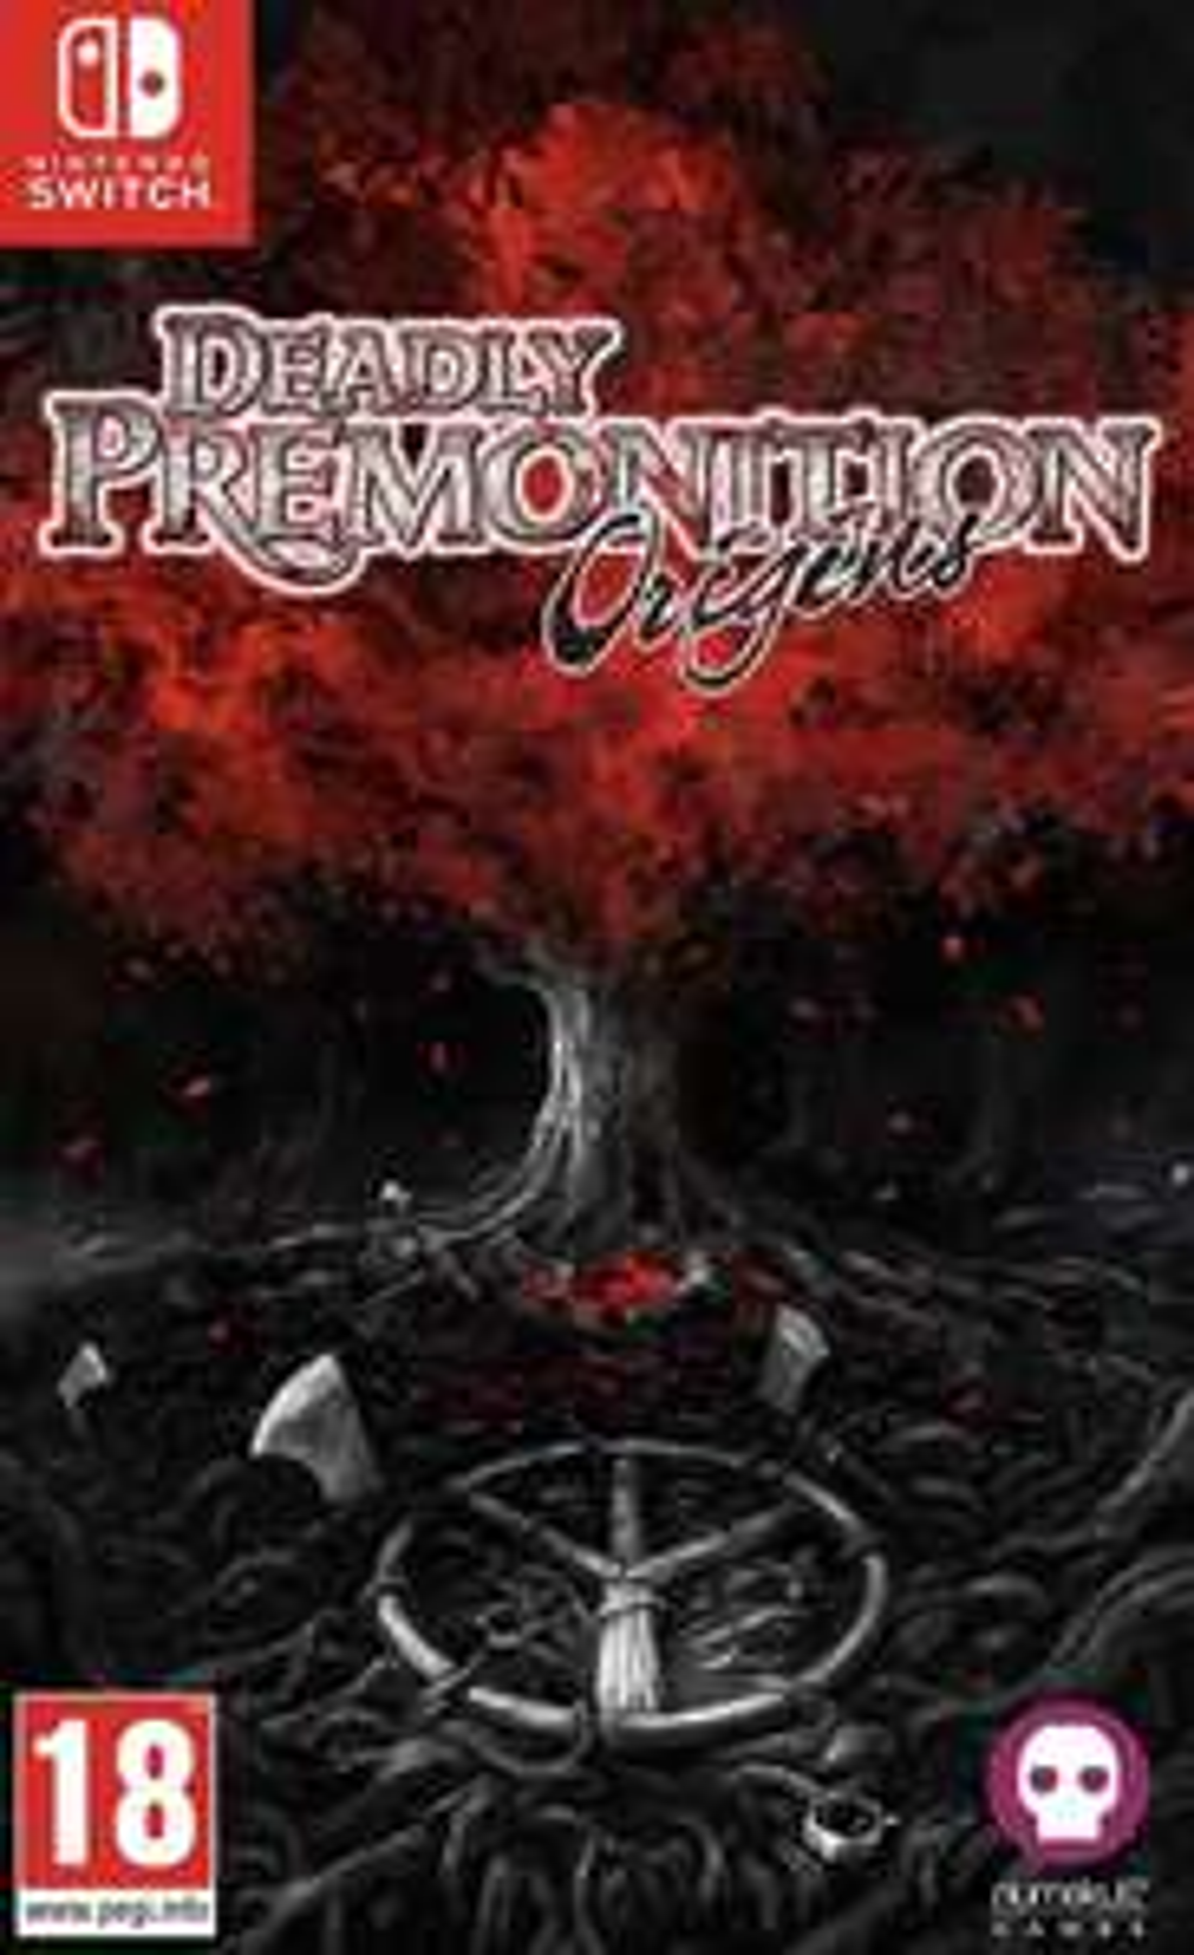 Deadly Premonition: Origins (Nintendo Switch) £24.85 @ Base